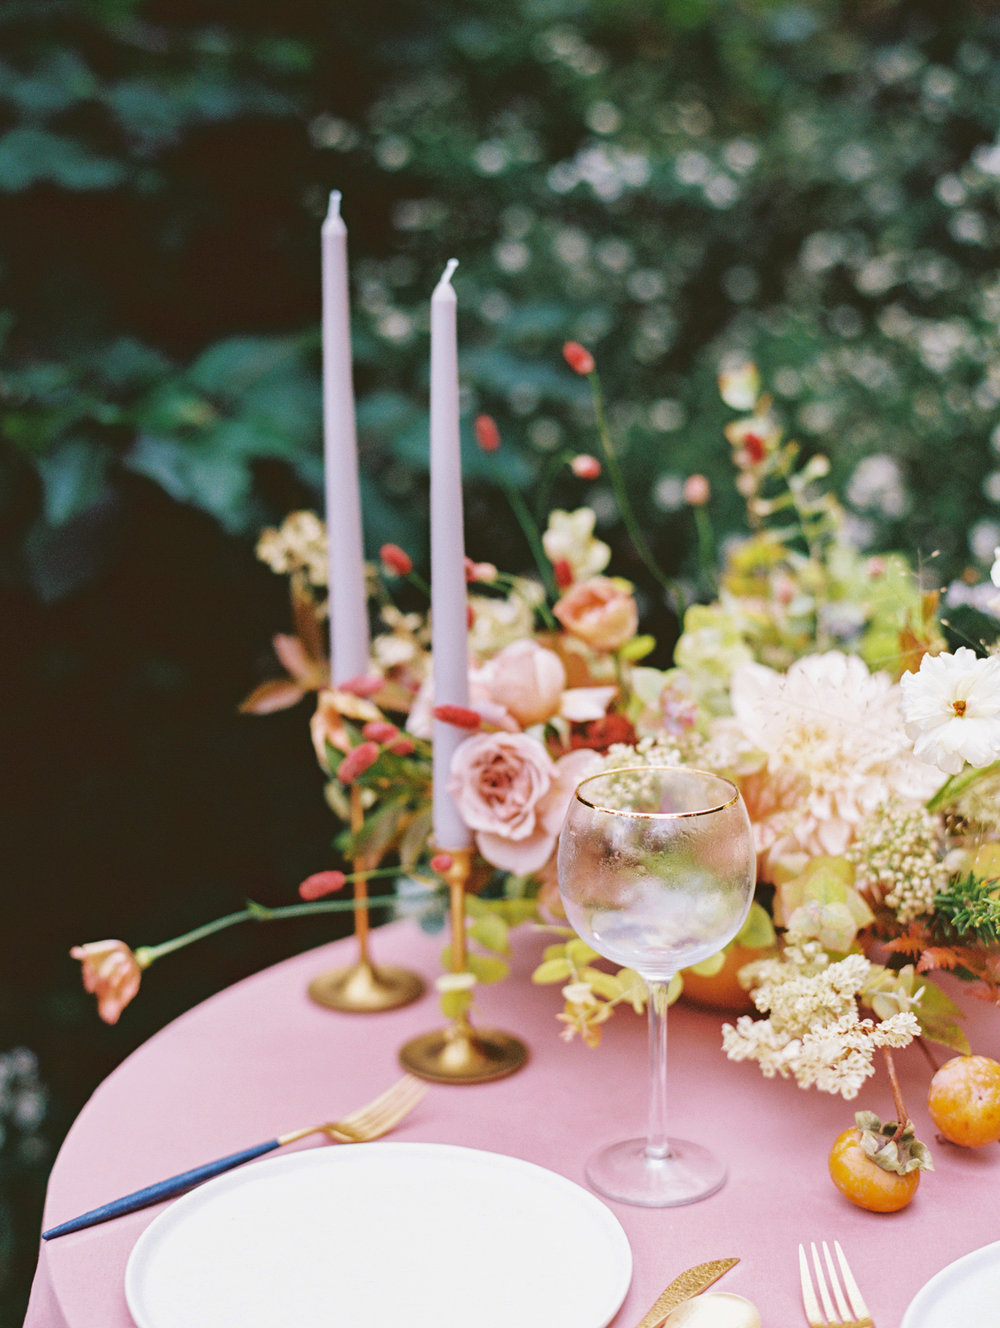 kelsandmichael_bridaleditorial_harvestelopement-90.jpg